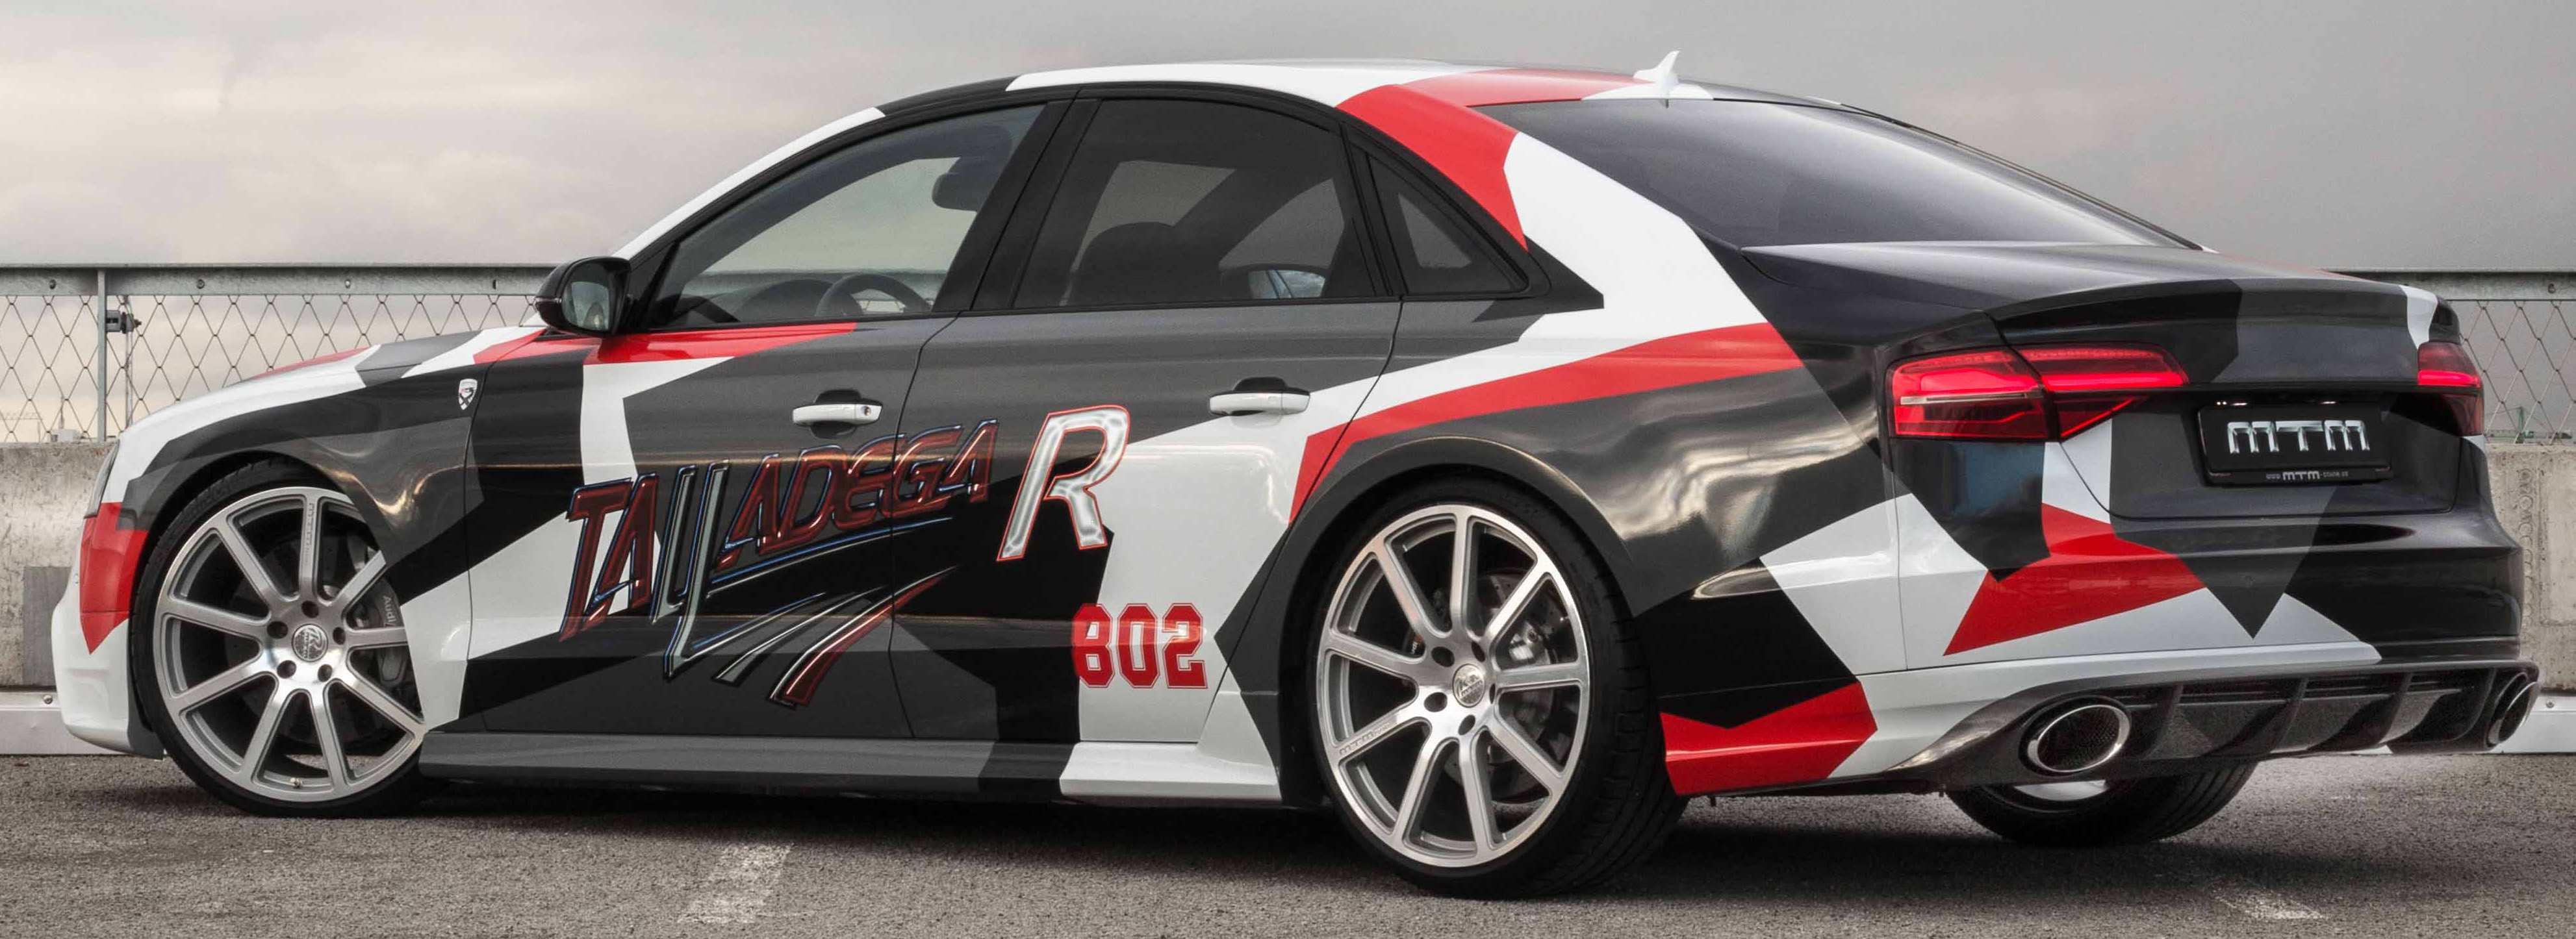 Audi_S8_Talladega_R_tuning_carwrap2